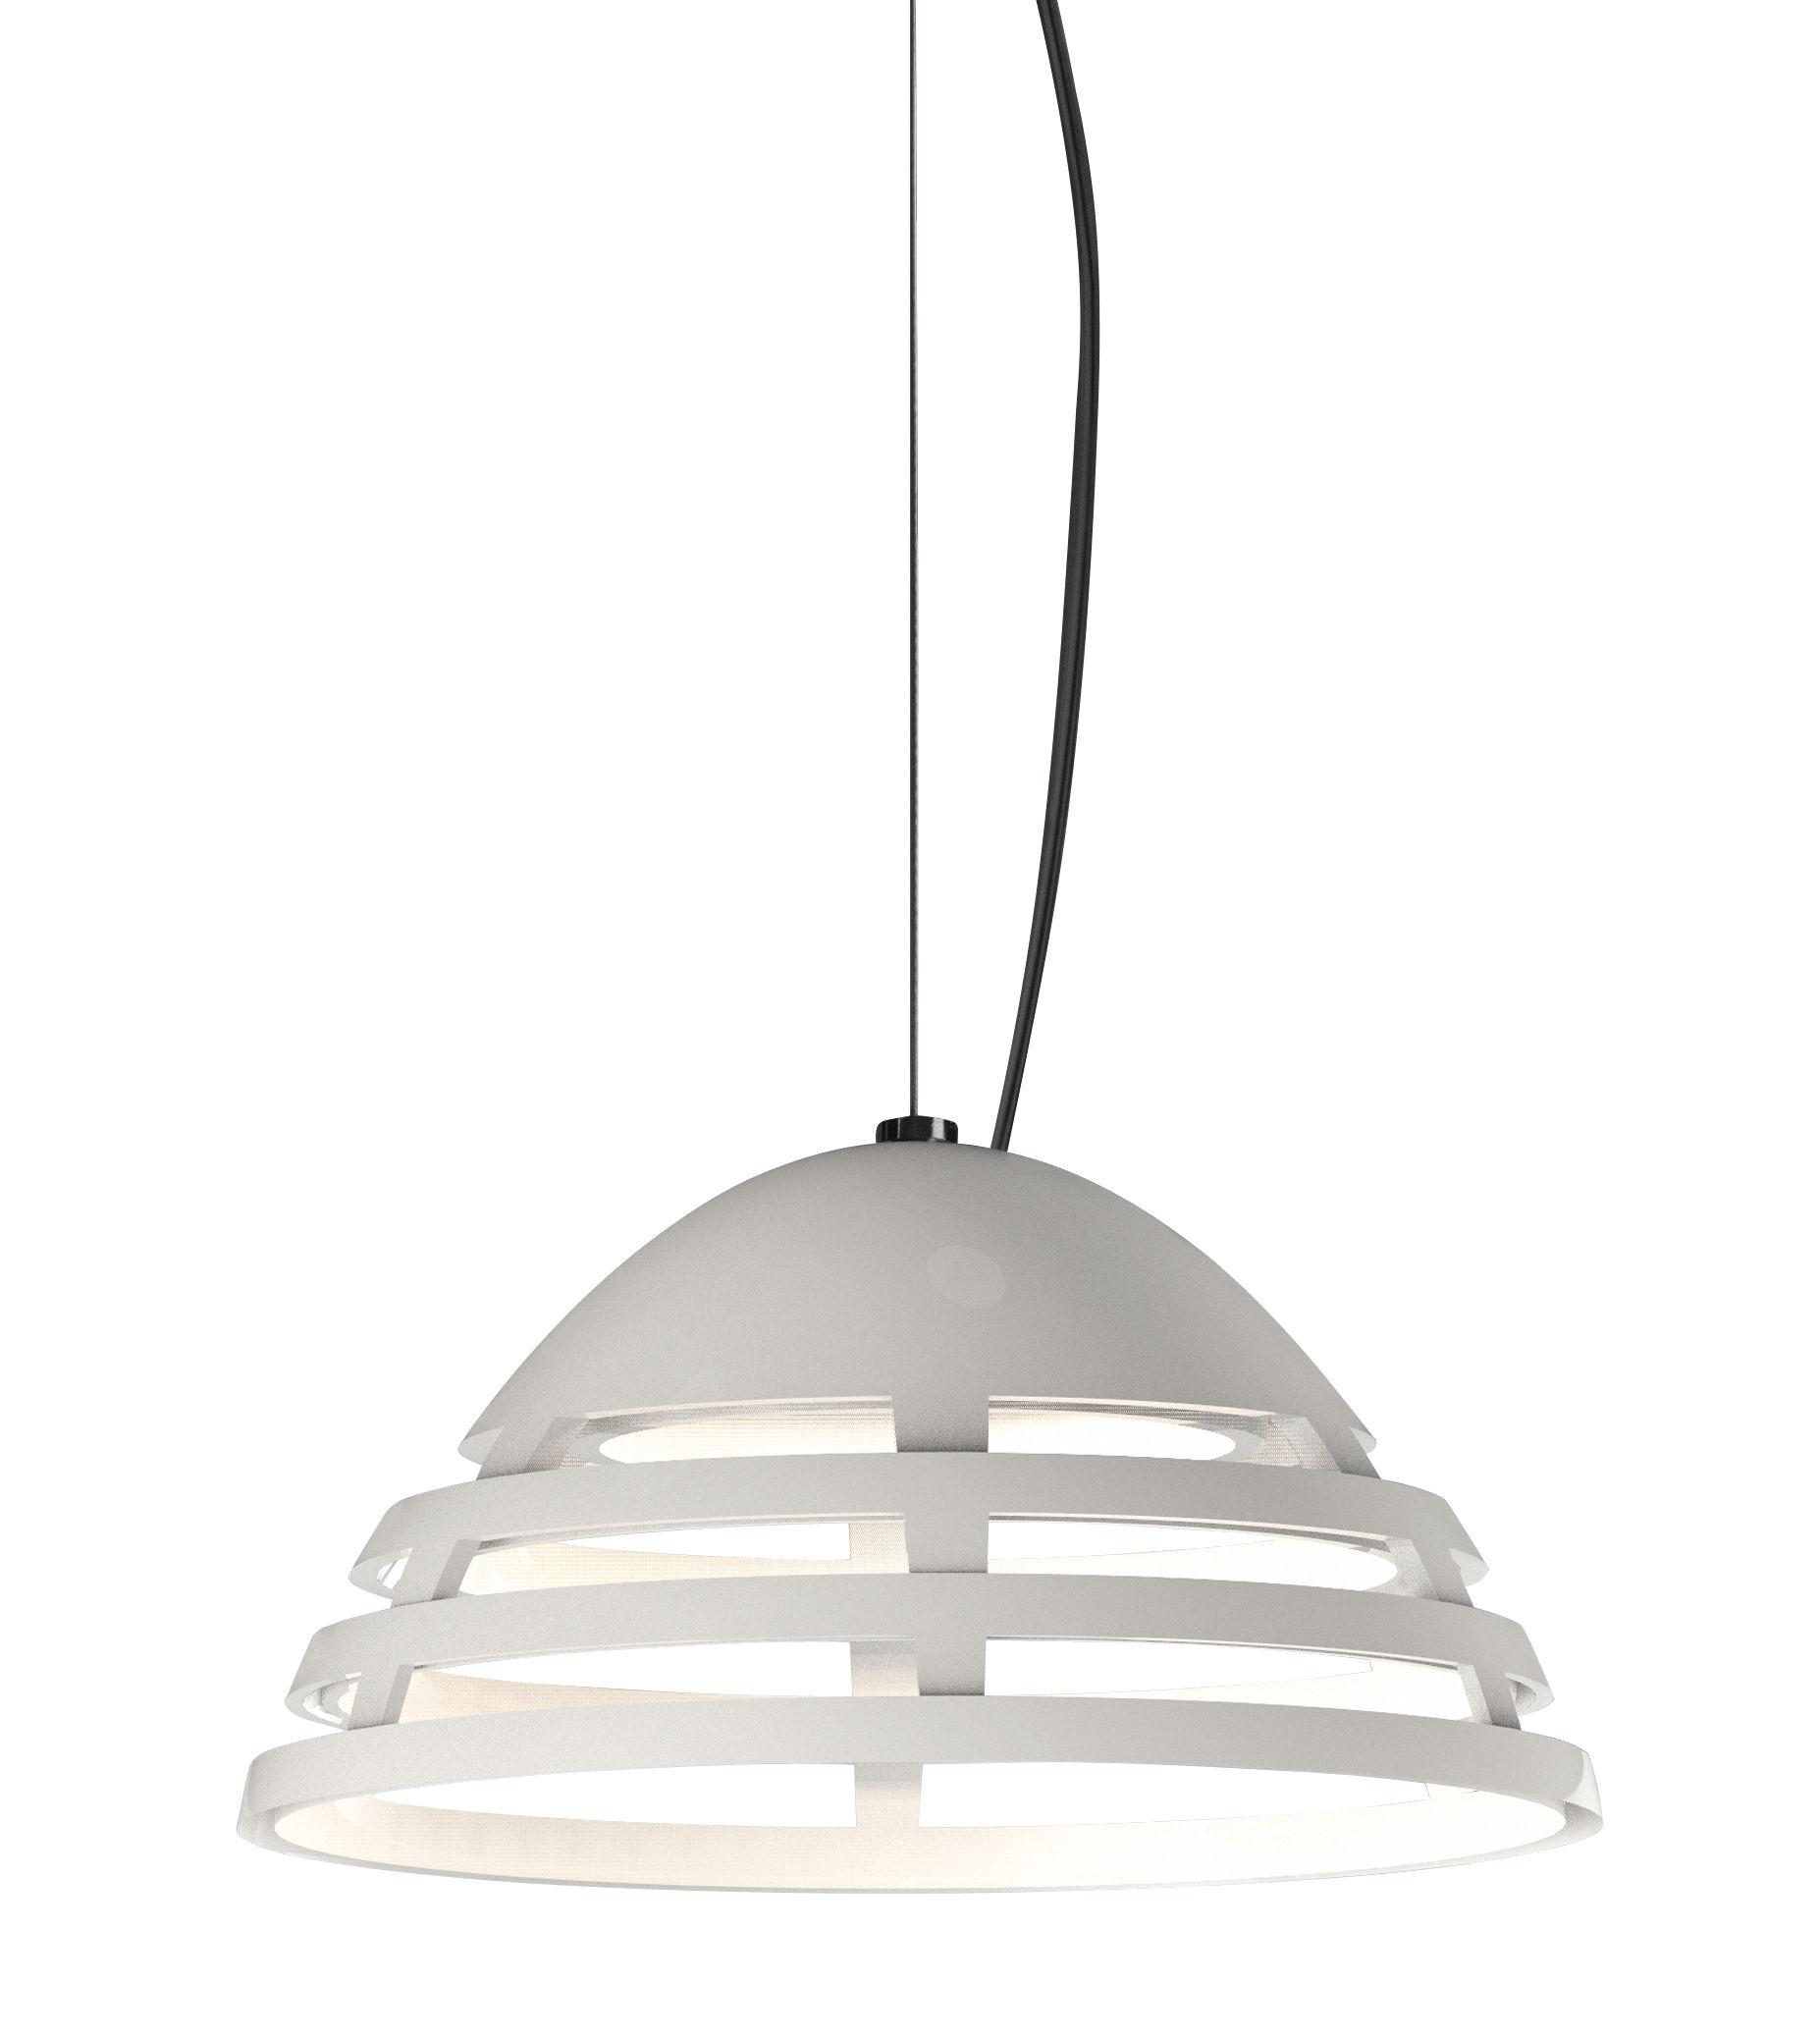 Lighting - Pendant Lighting - Incipit LED Pendant - LED / Ø 21 cm - Aluminium by Artemide - White - Painted aluminium